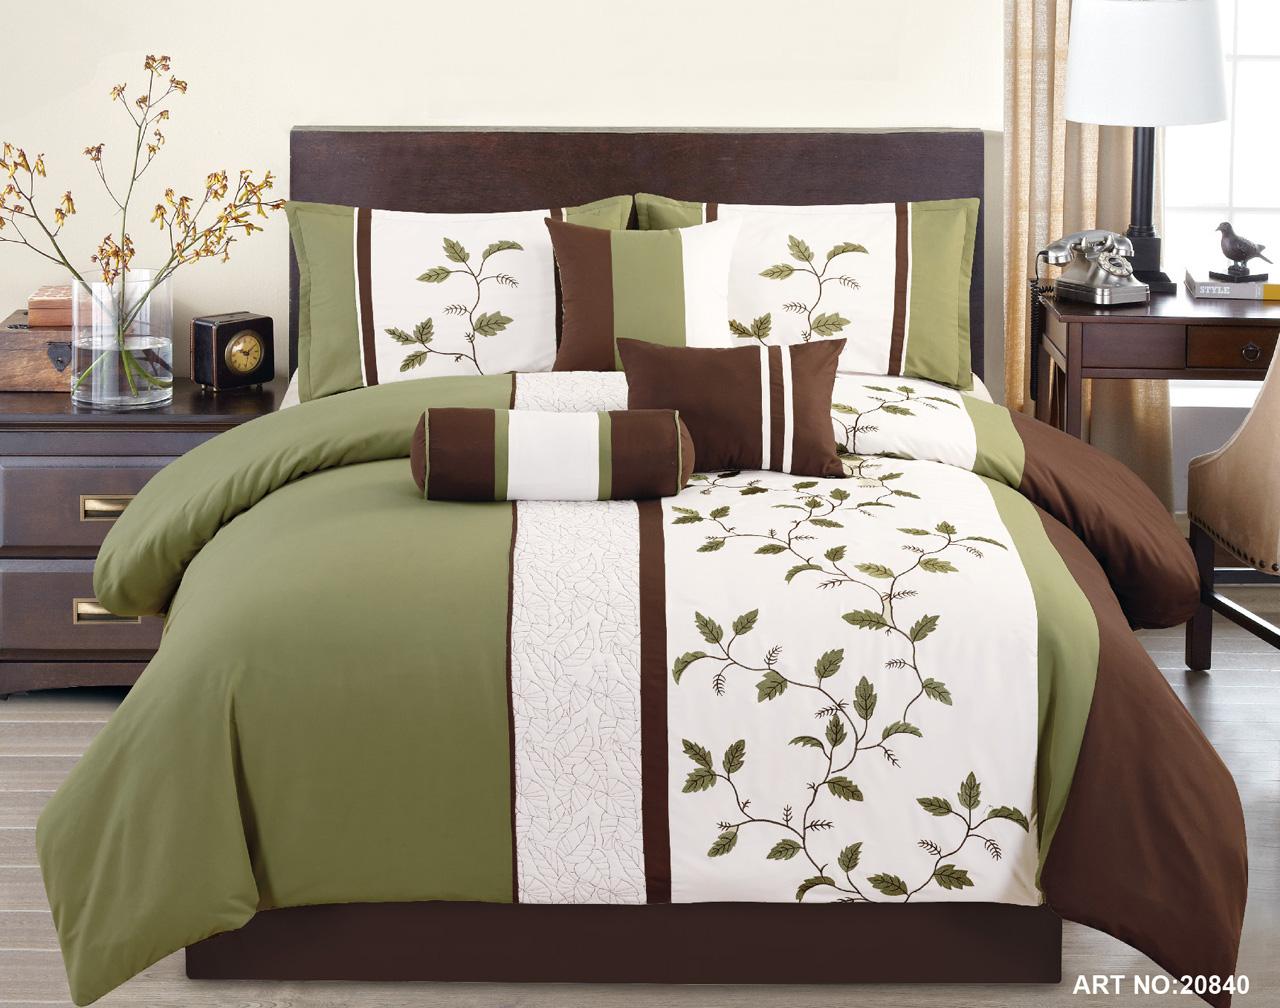 KingLinen 7 Piece Sage/White/Chocolate Embroidered Comforter Set